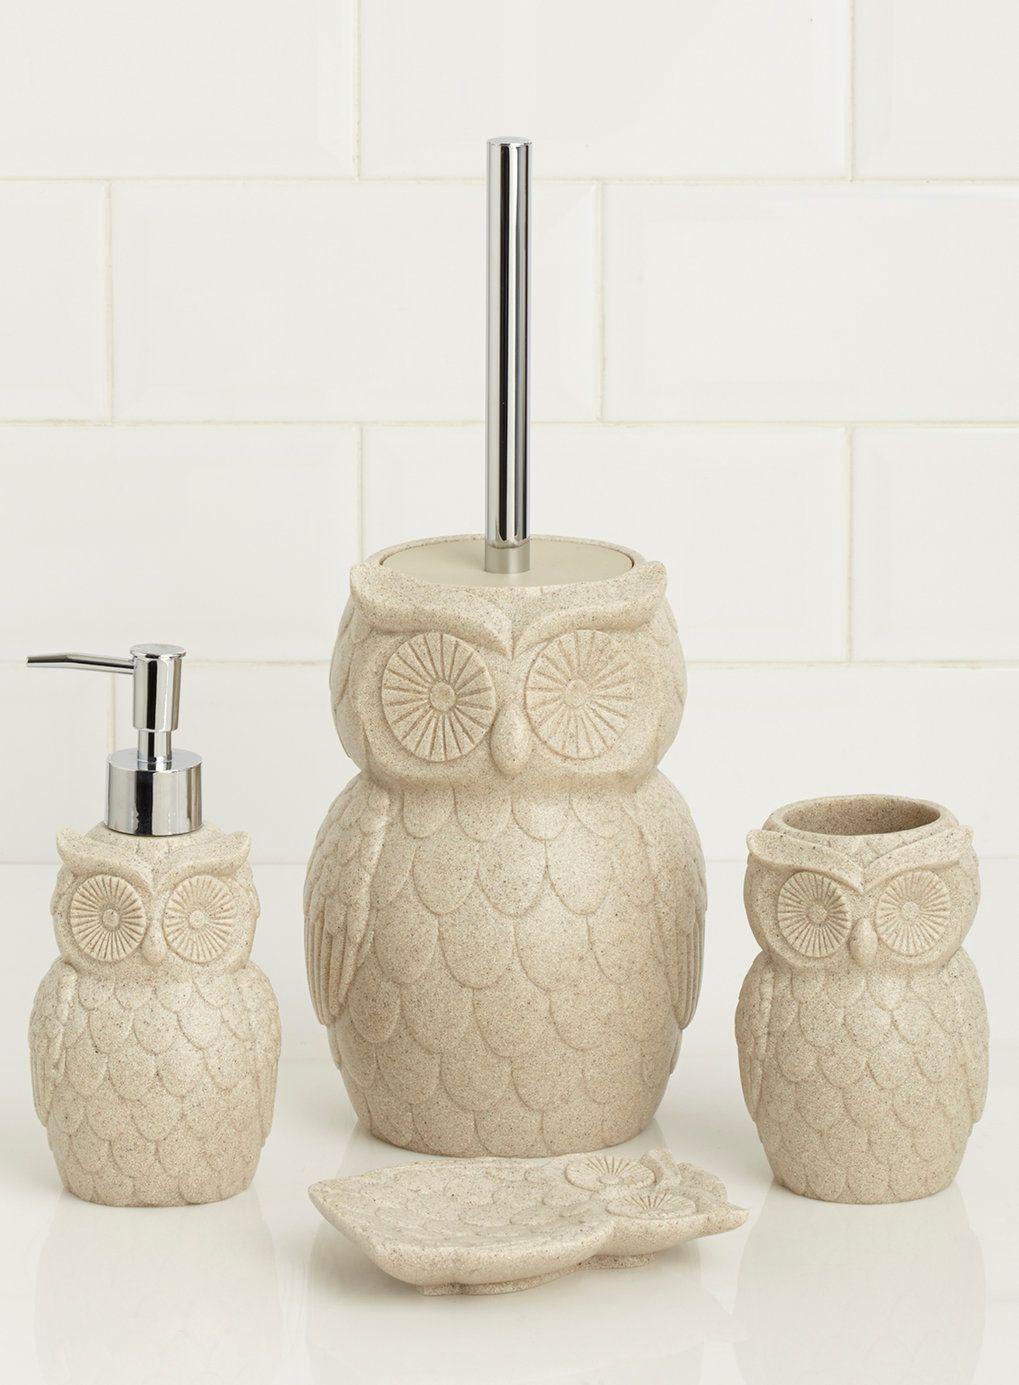 Photo 2 of Natural owl shaped soap dispenser | Living | Pinterest ...